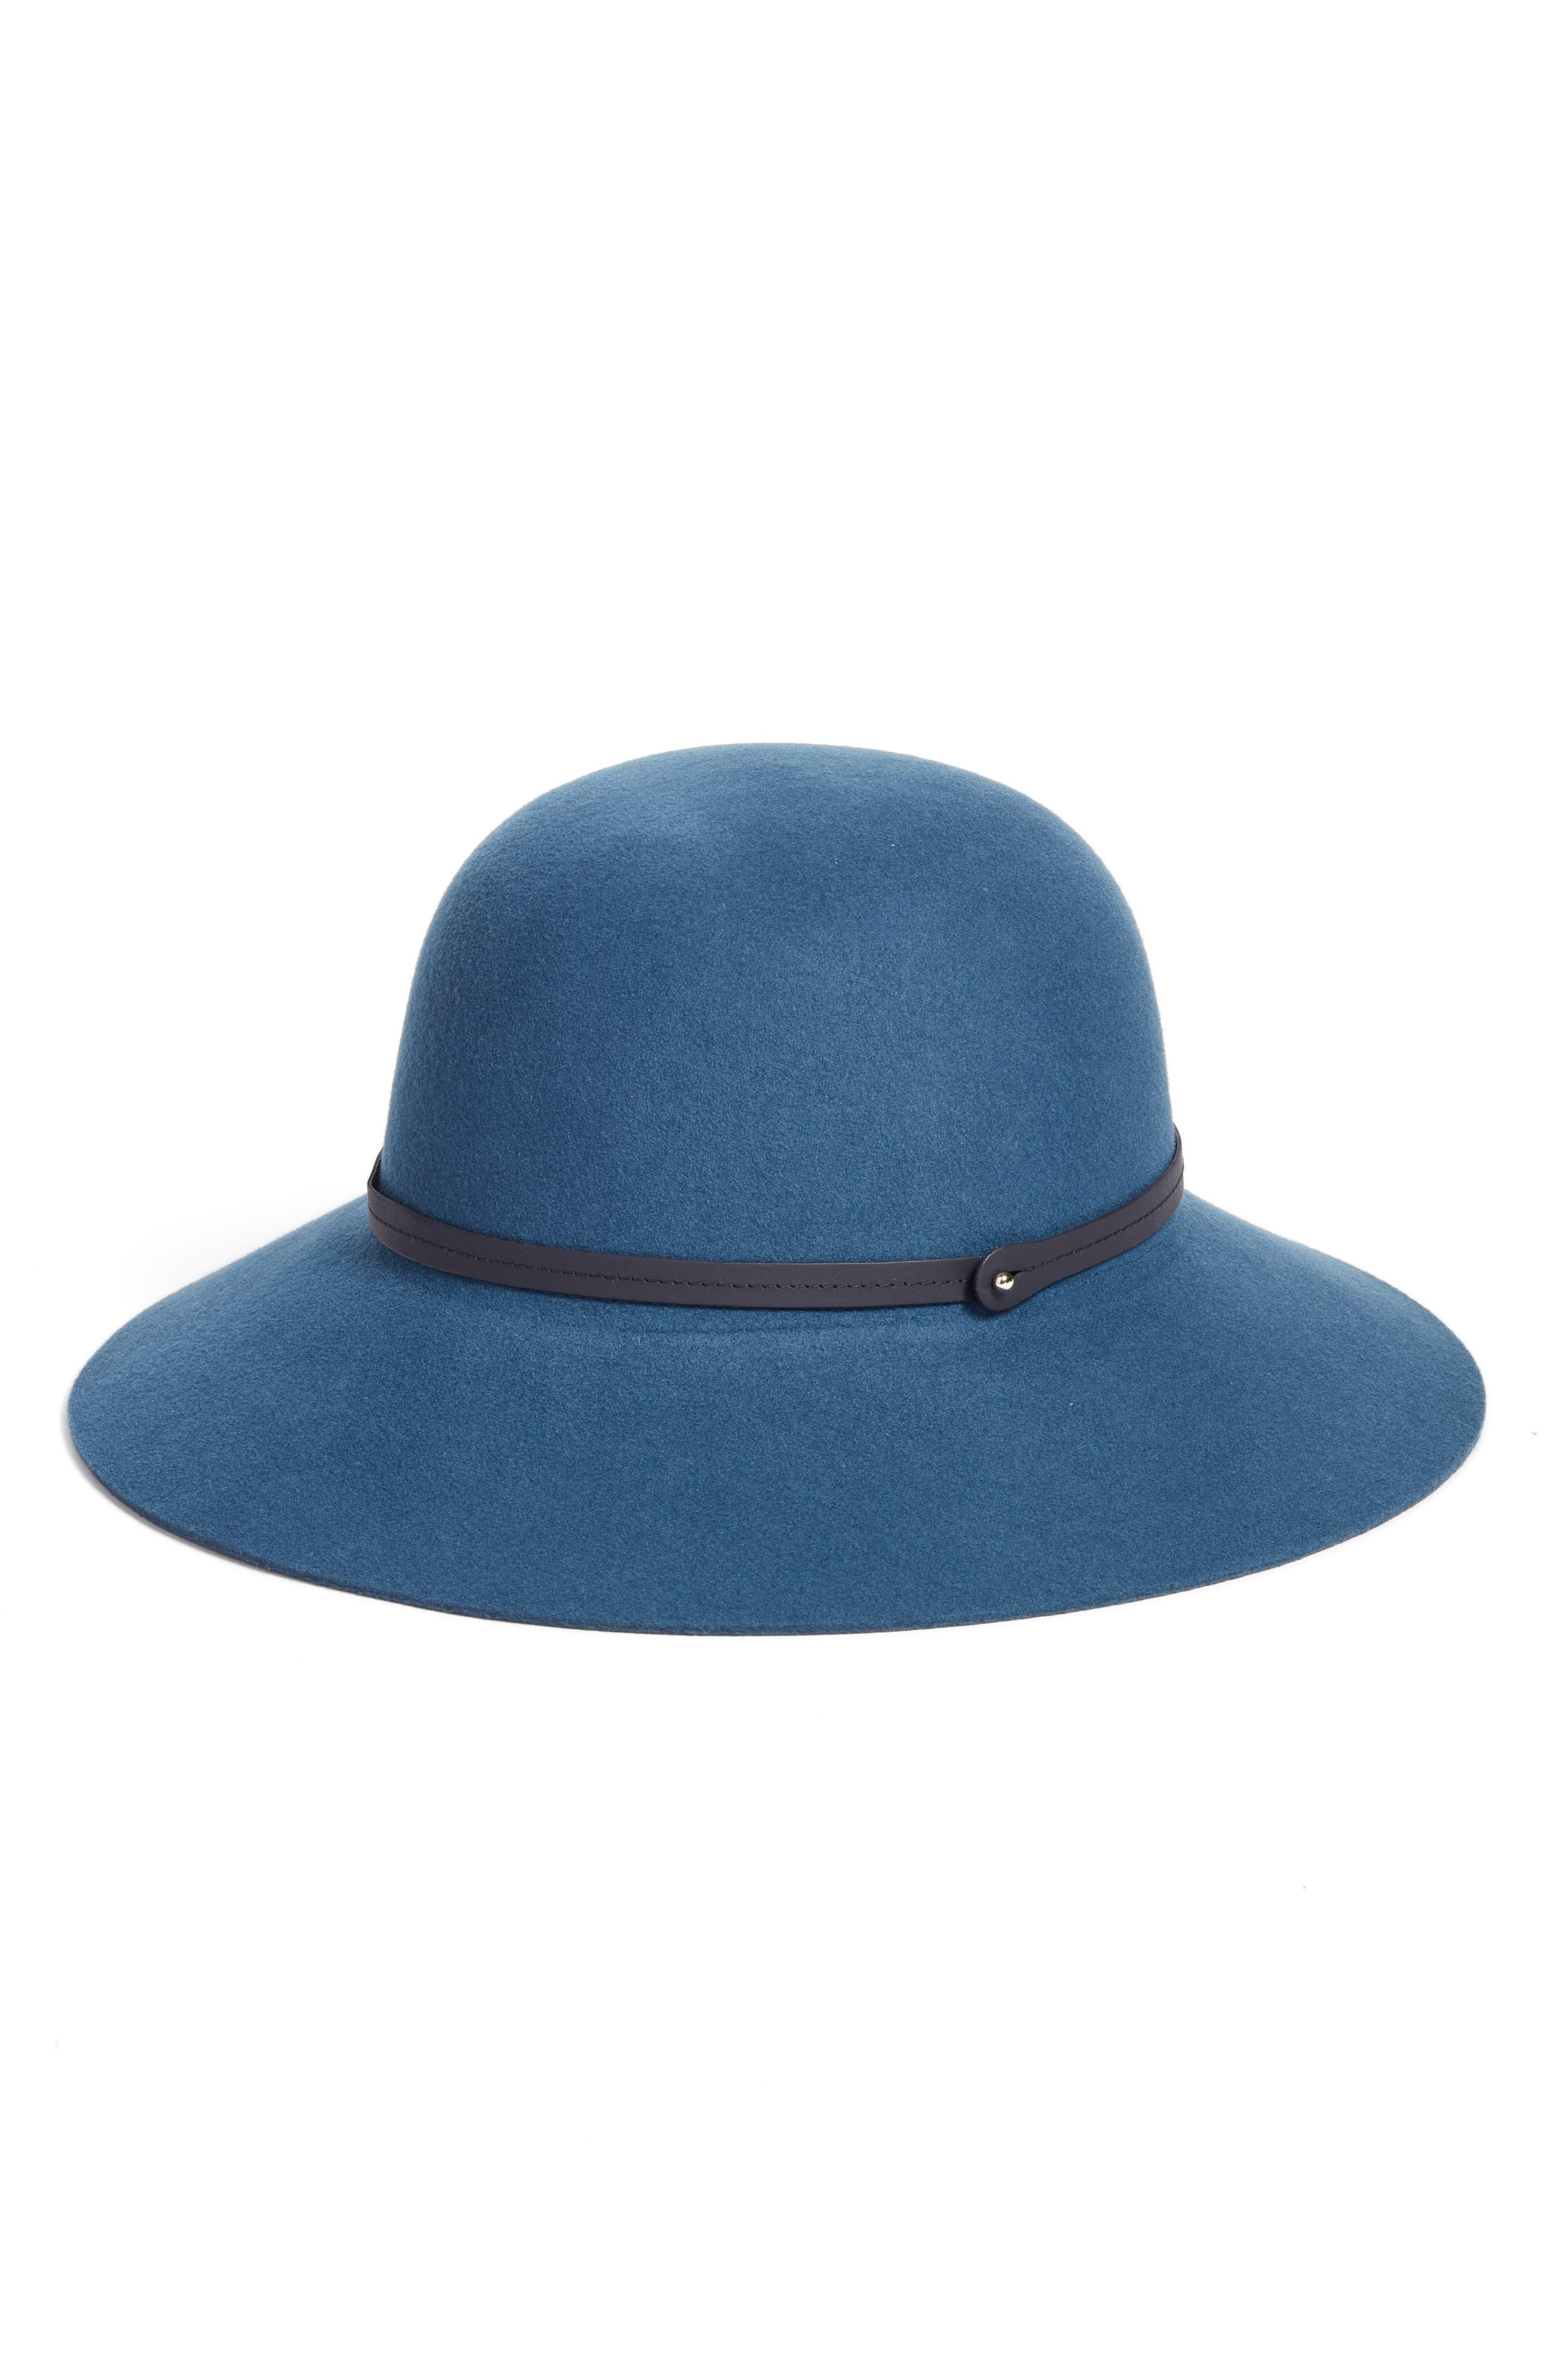 Angled Brim Wool Felt Hat,                             Alternate thumbnail 2, color,                             Smoke Blue/ Navy